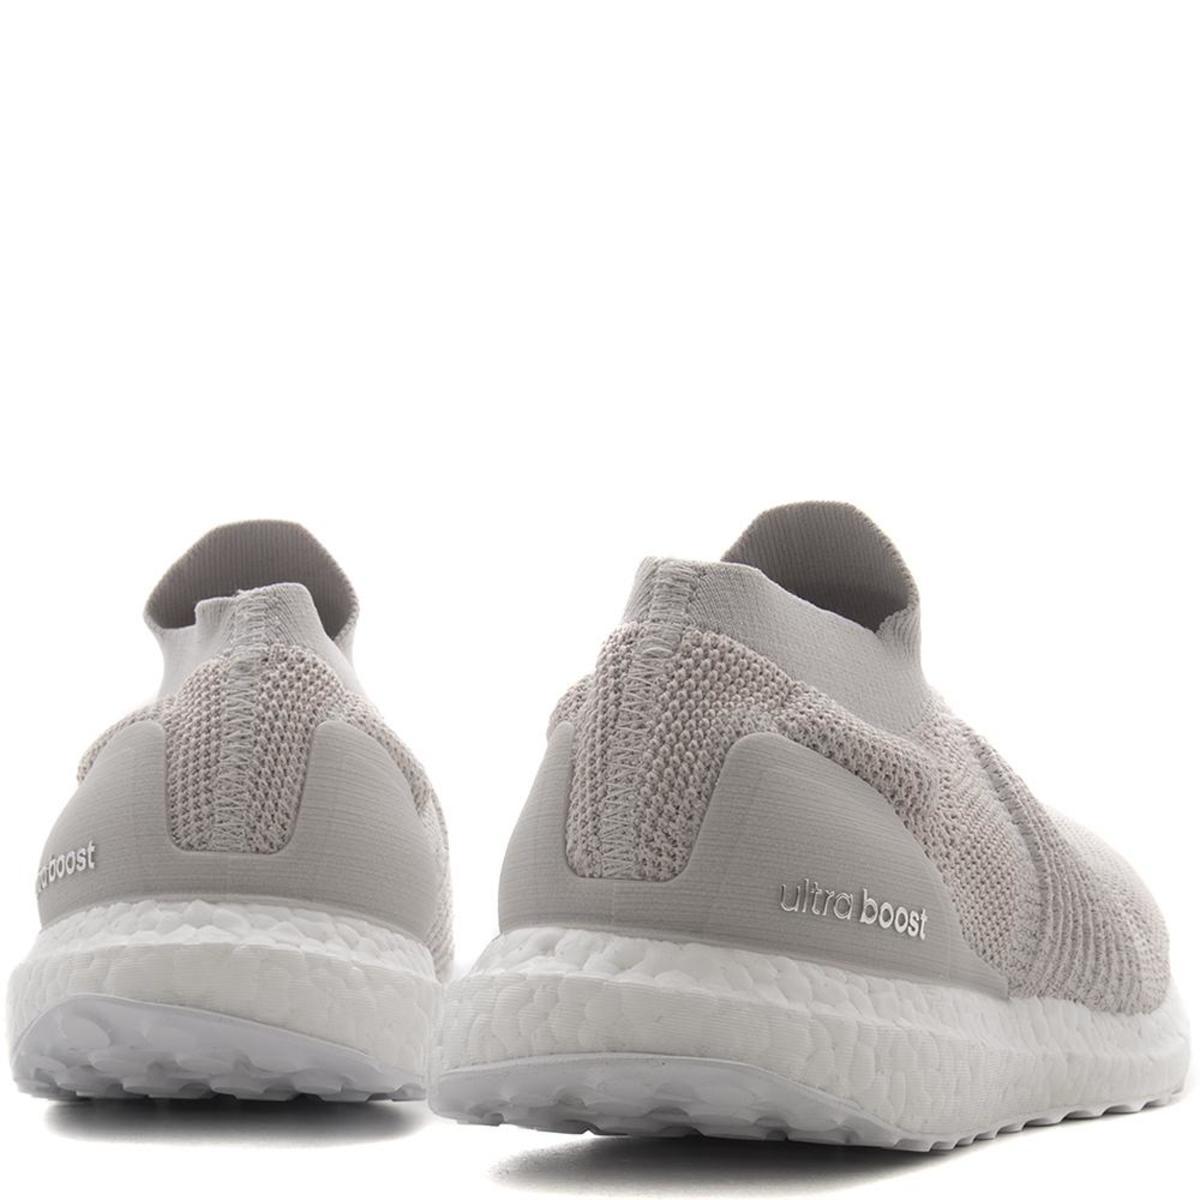 84efb49f07c8e Adidas Ultraboost Laceless Sneakers - Chalk Pearl